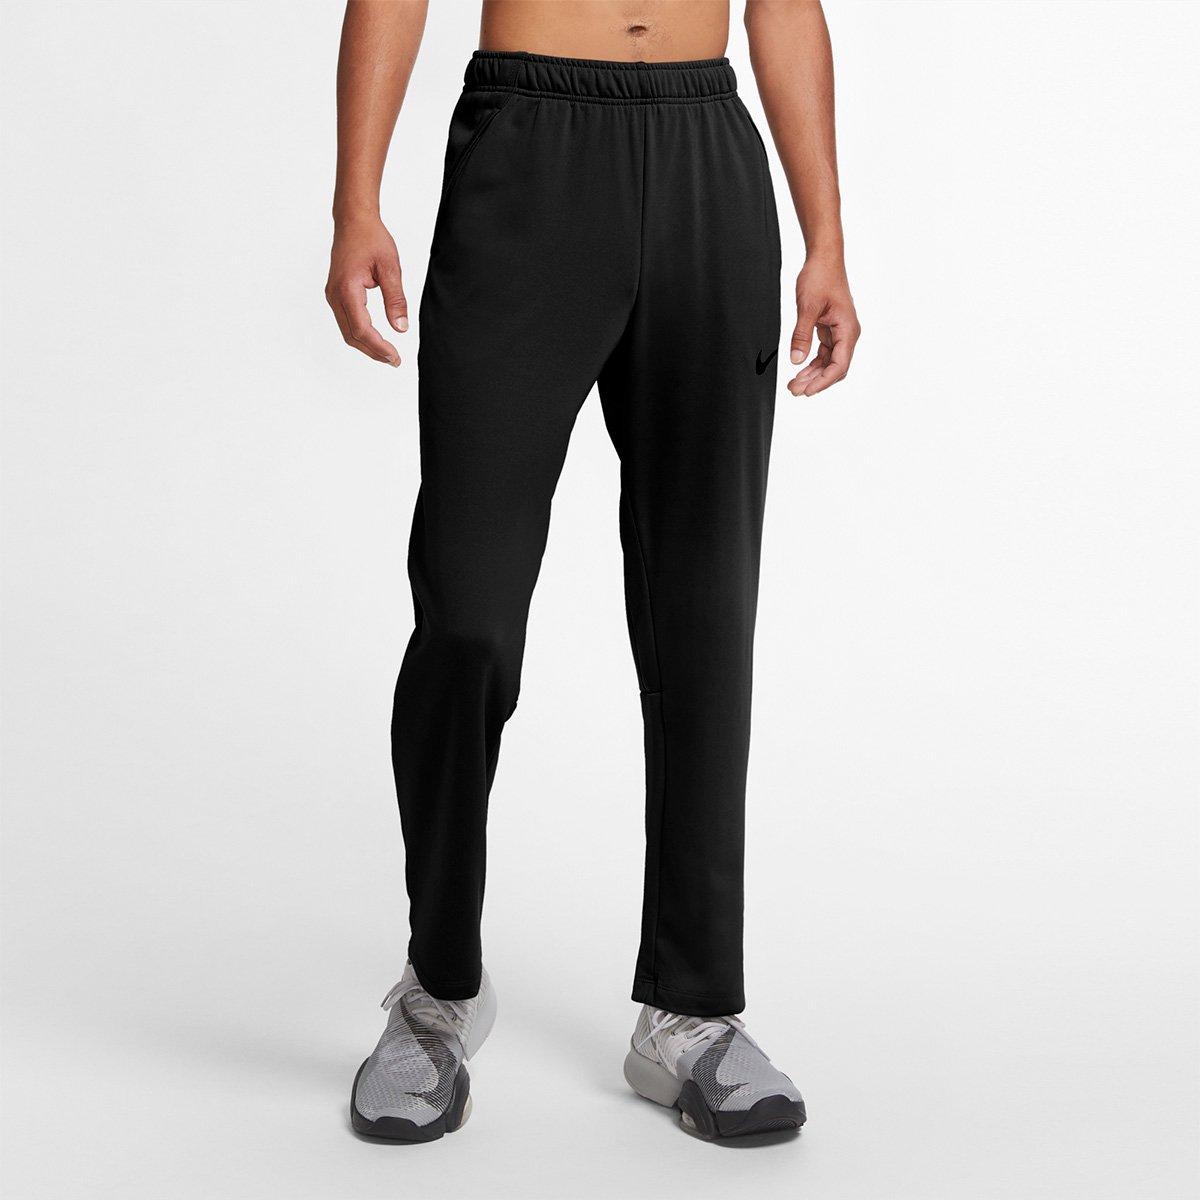 Calça Nike Epic Knit Masculina